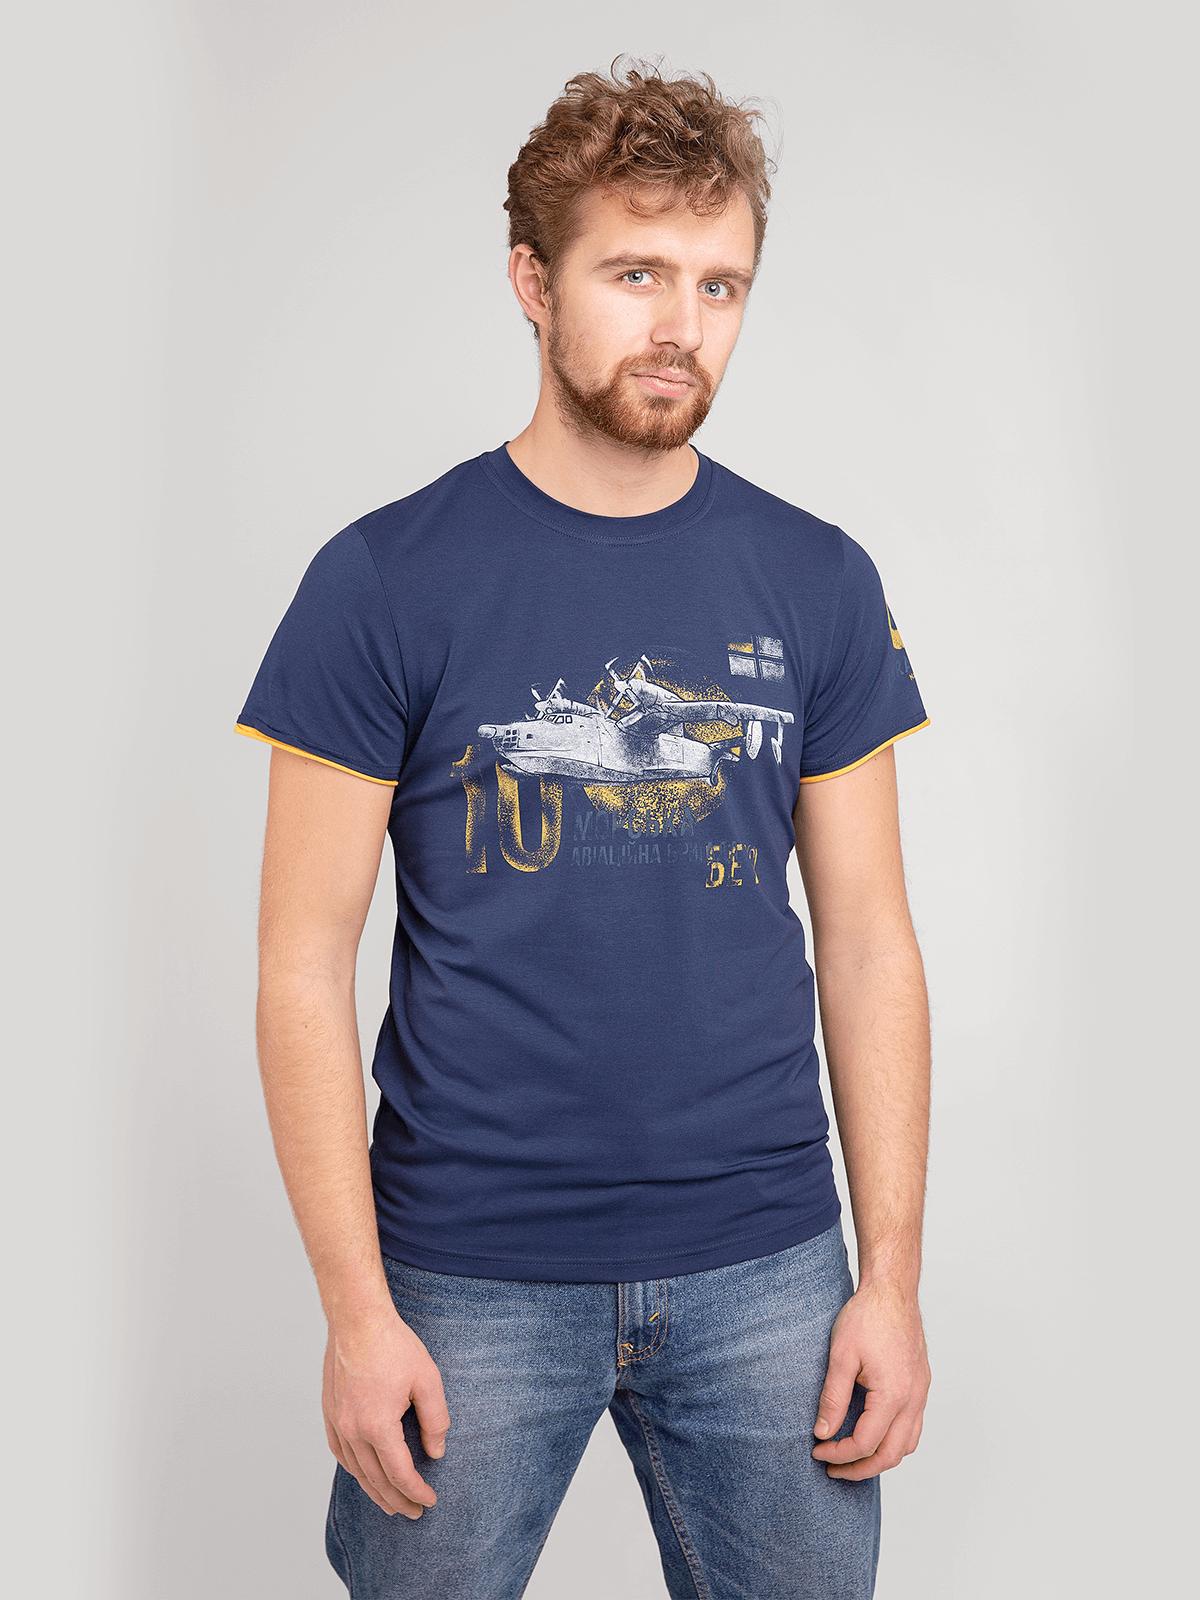 Men's T-Shirt Be-12. Color dark blue. Material: 95% cotton, 5% spandex.